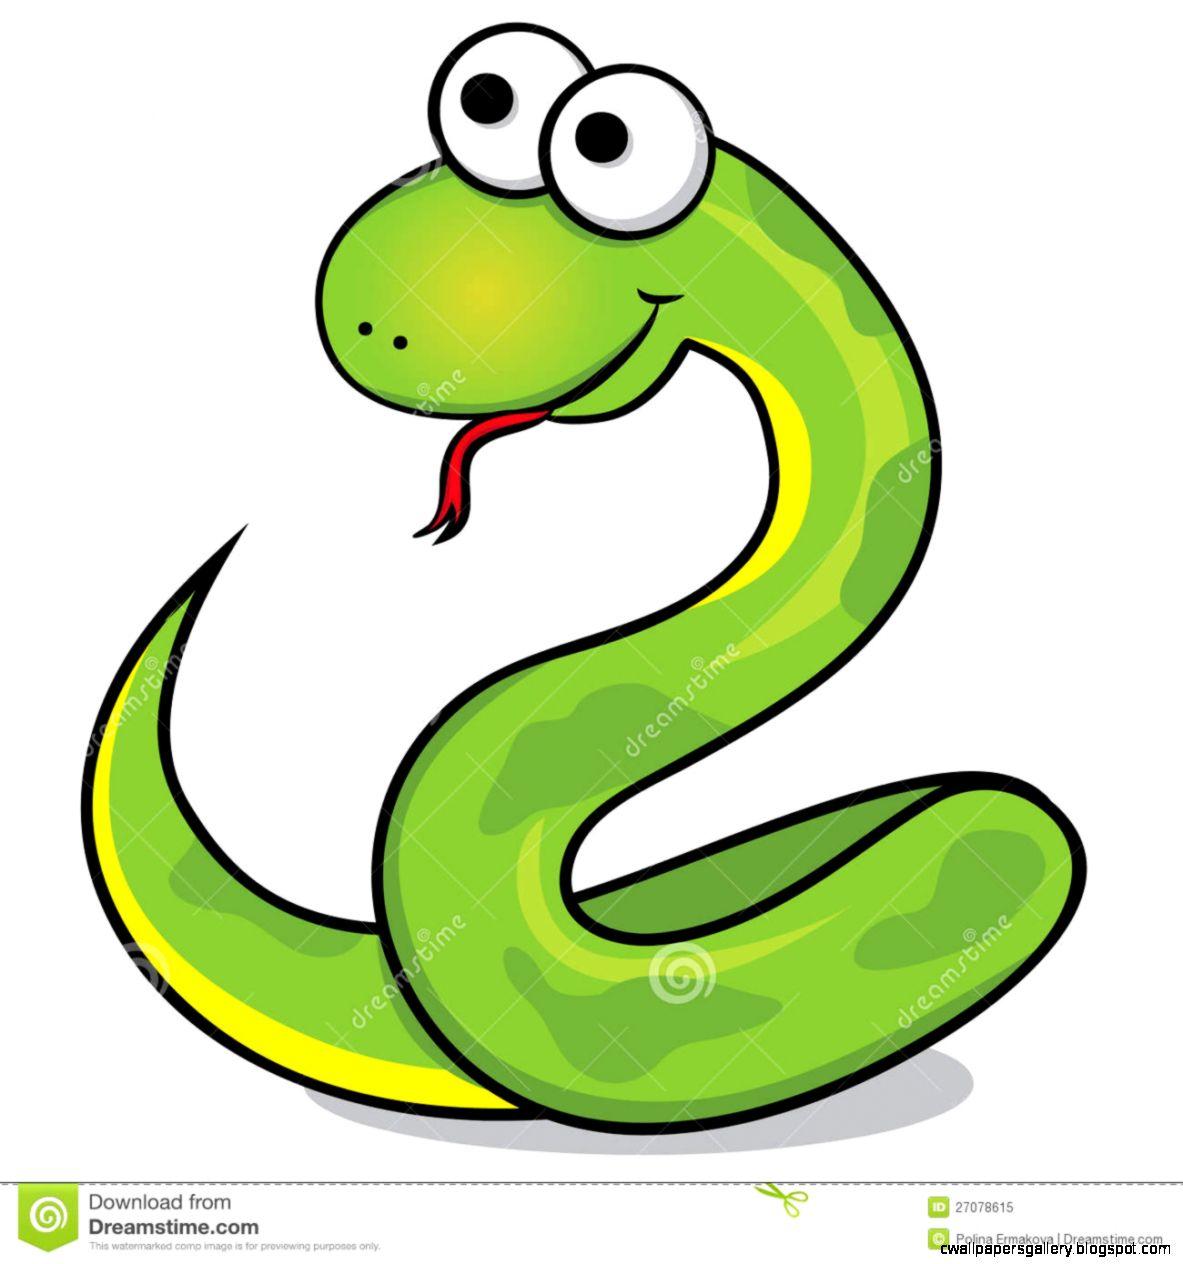 Snake clip art free download